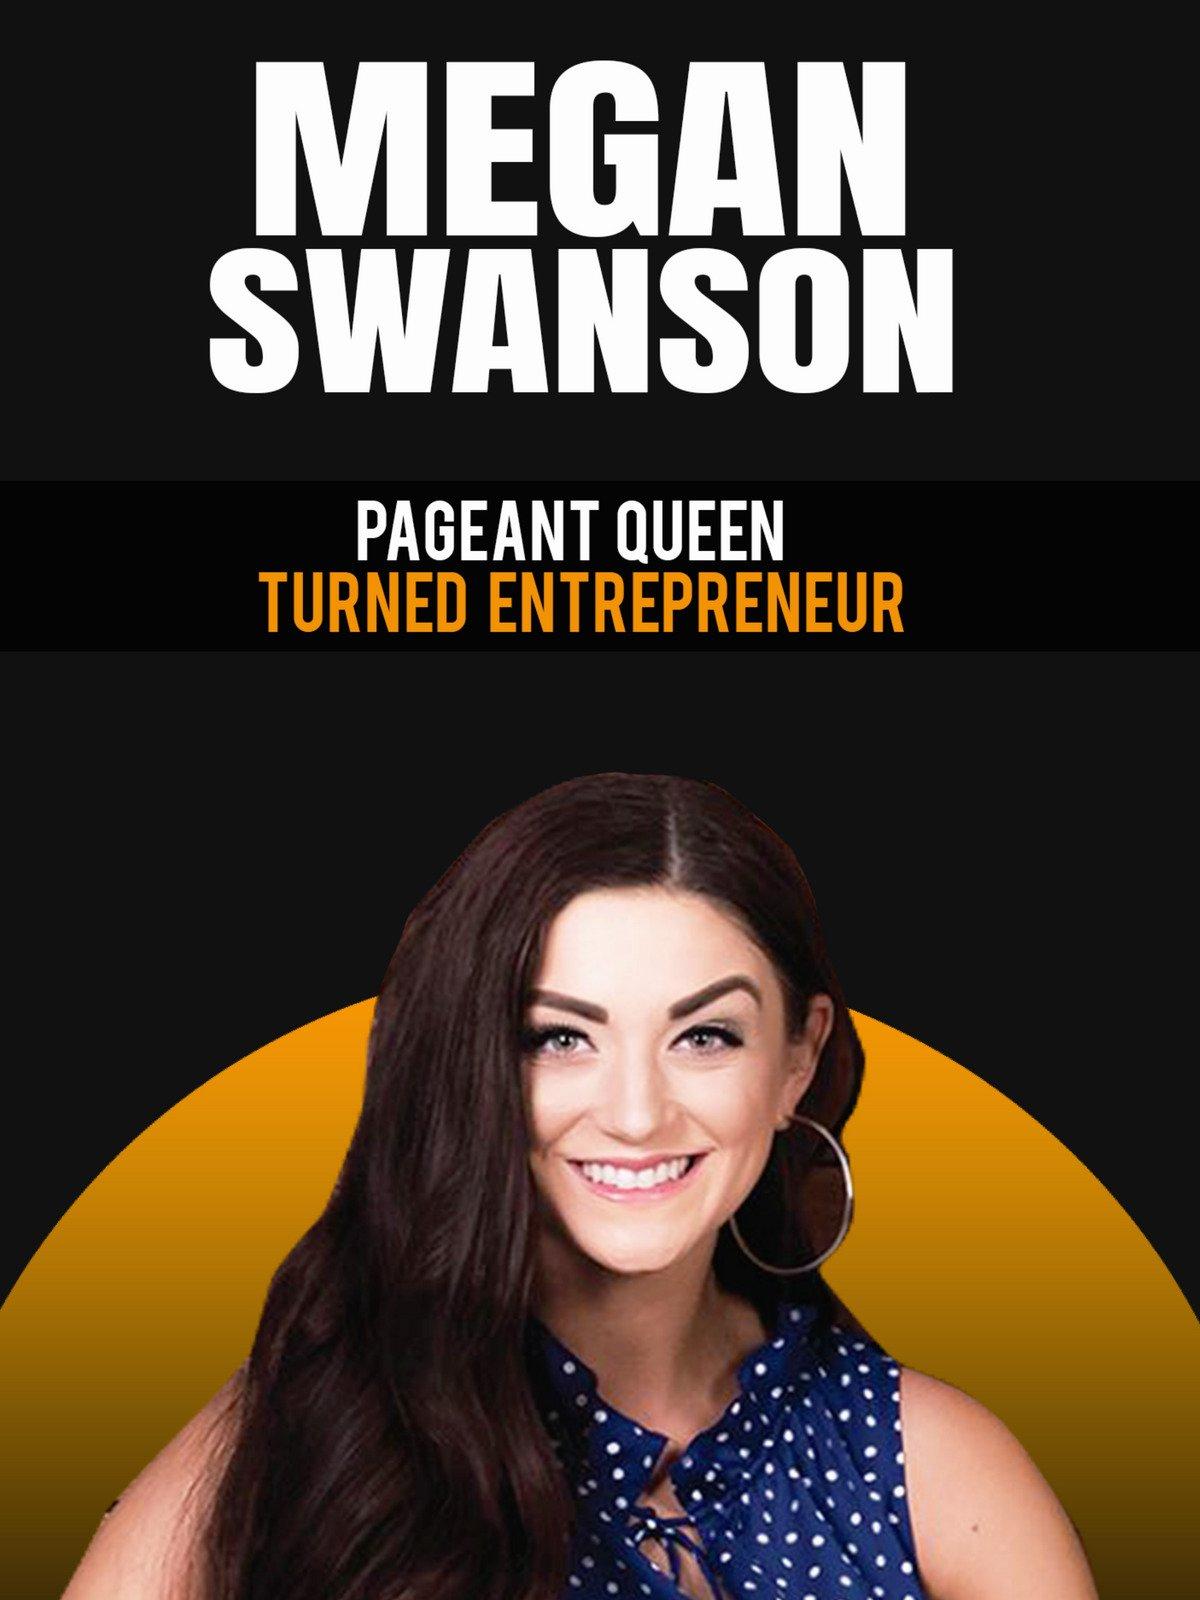 Megan Swanson: Pageant Queen Turned Entrepreneur